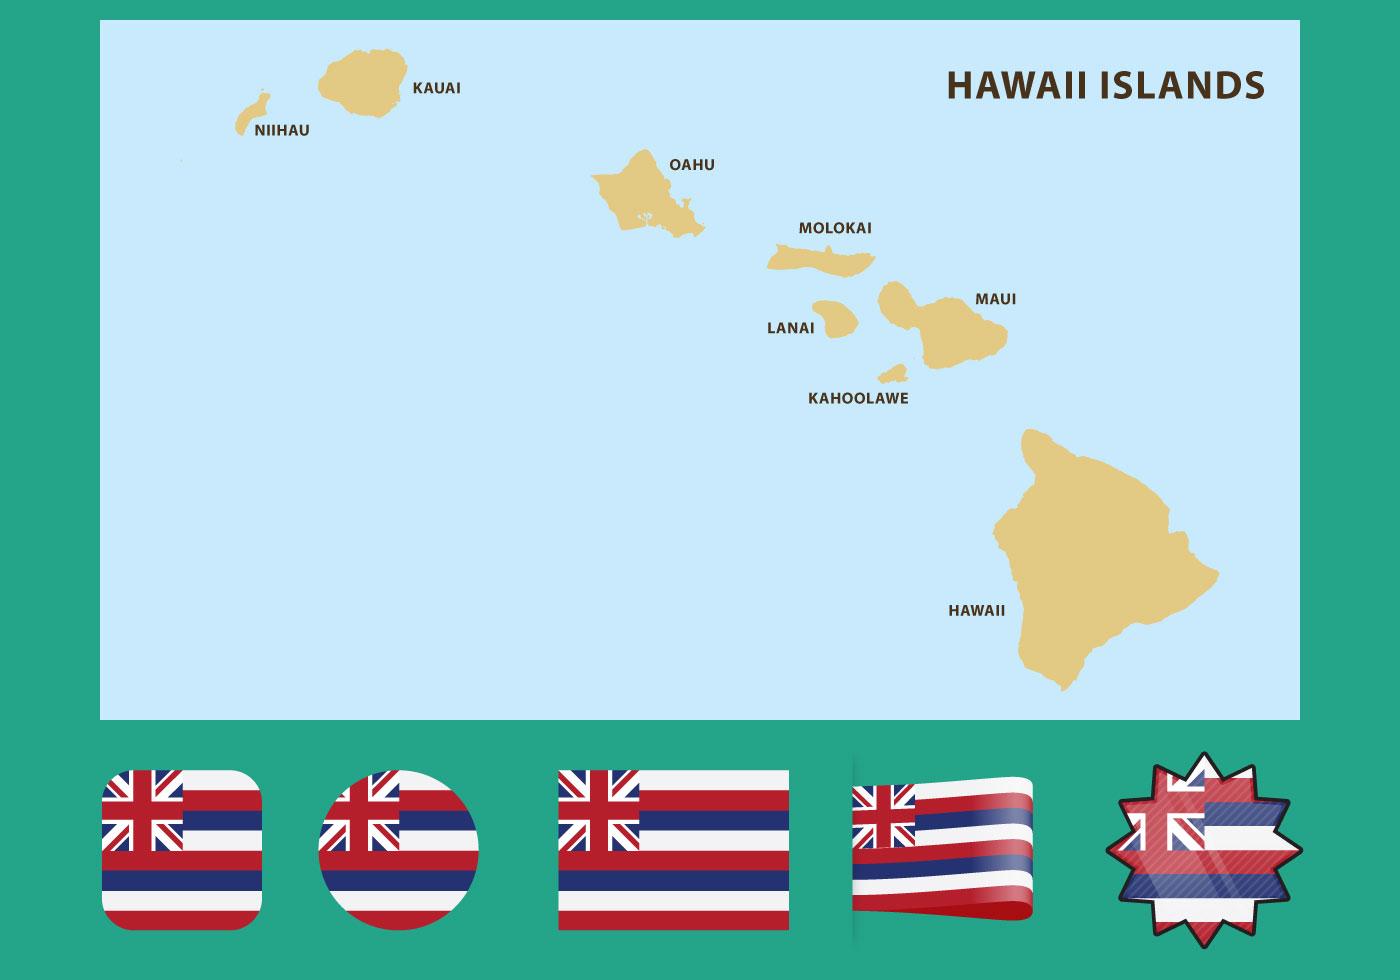 Hawaii Islands Free Vector Art - (1166 Free Downloads)